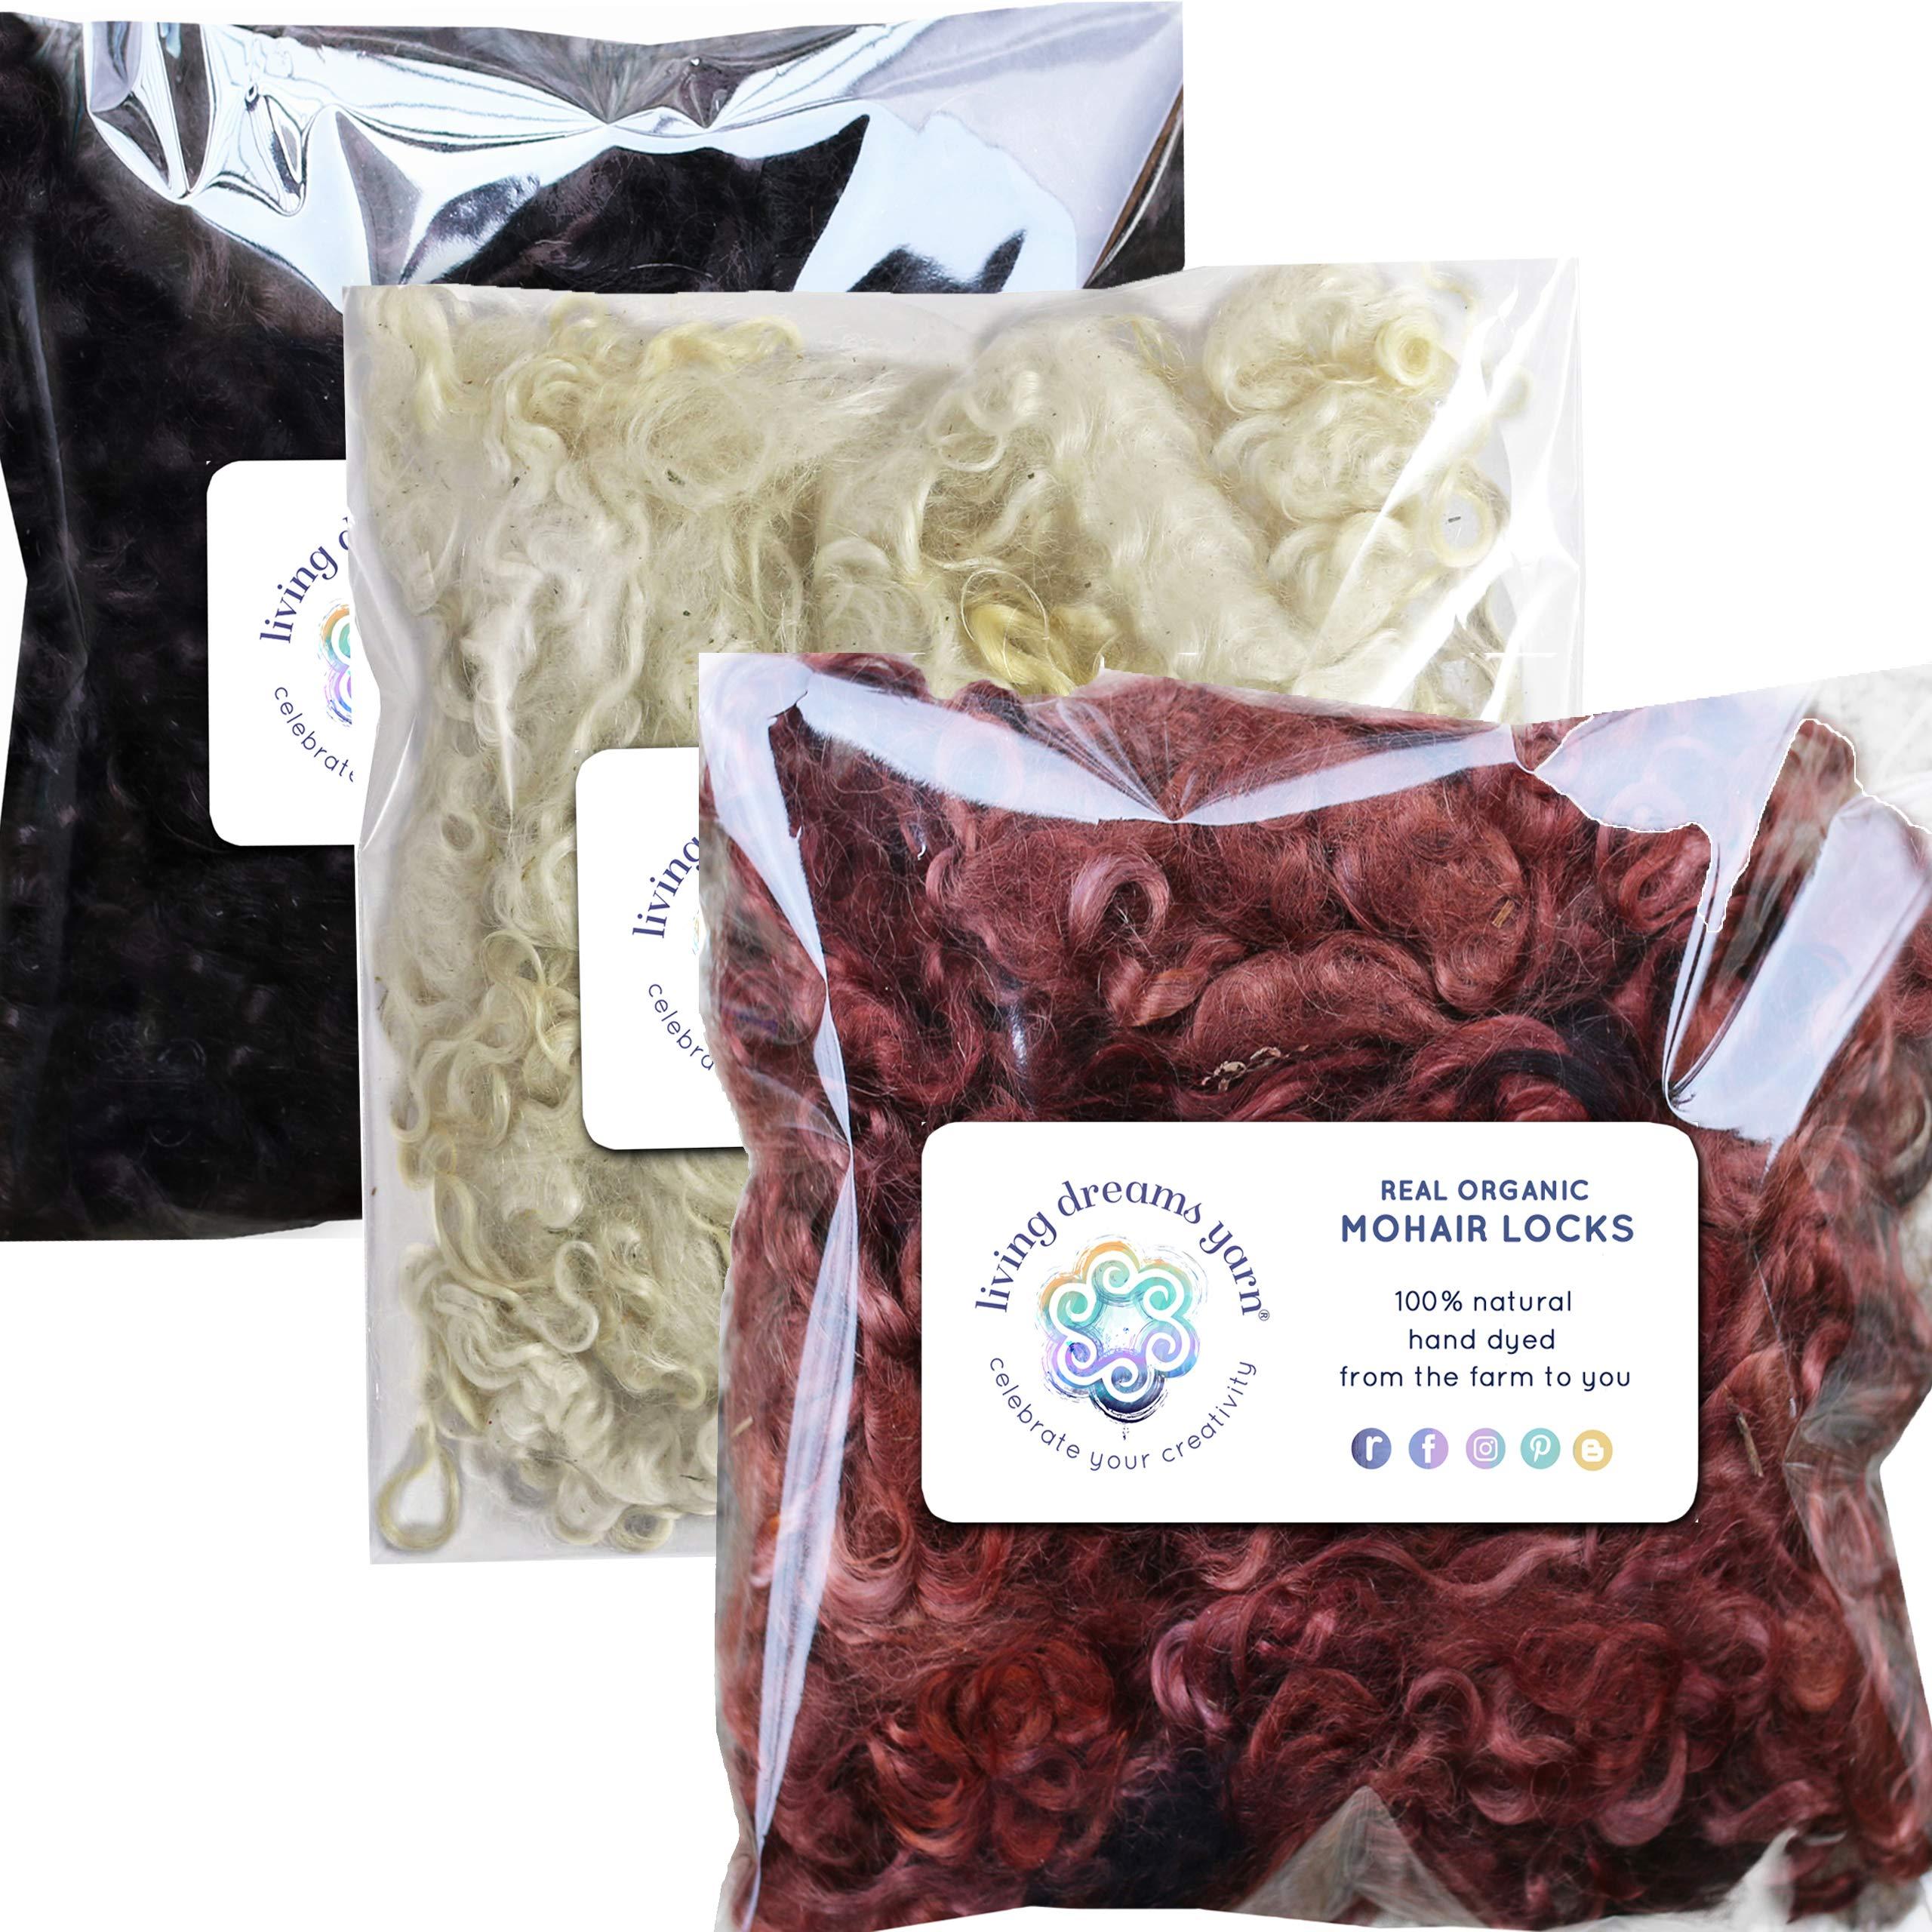 Real Mohair Wool Locks, Organic Hand Dyed Fiber for Felting, Blending, Spinning, Knitting, Doll Hair and Embellishments. 3 Ounce, White, Brown, Black